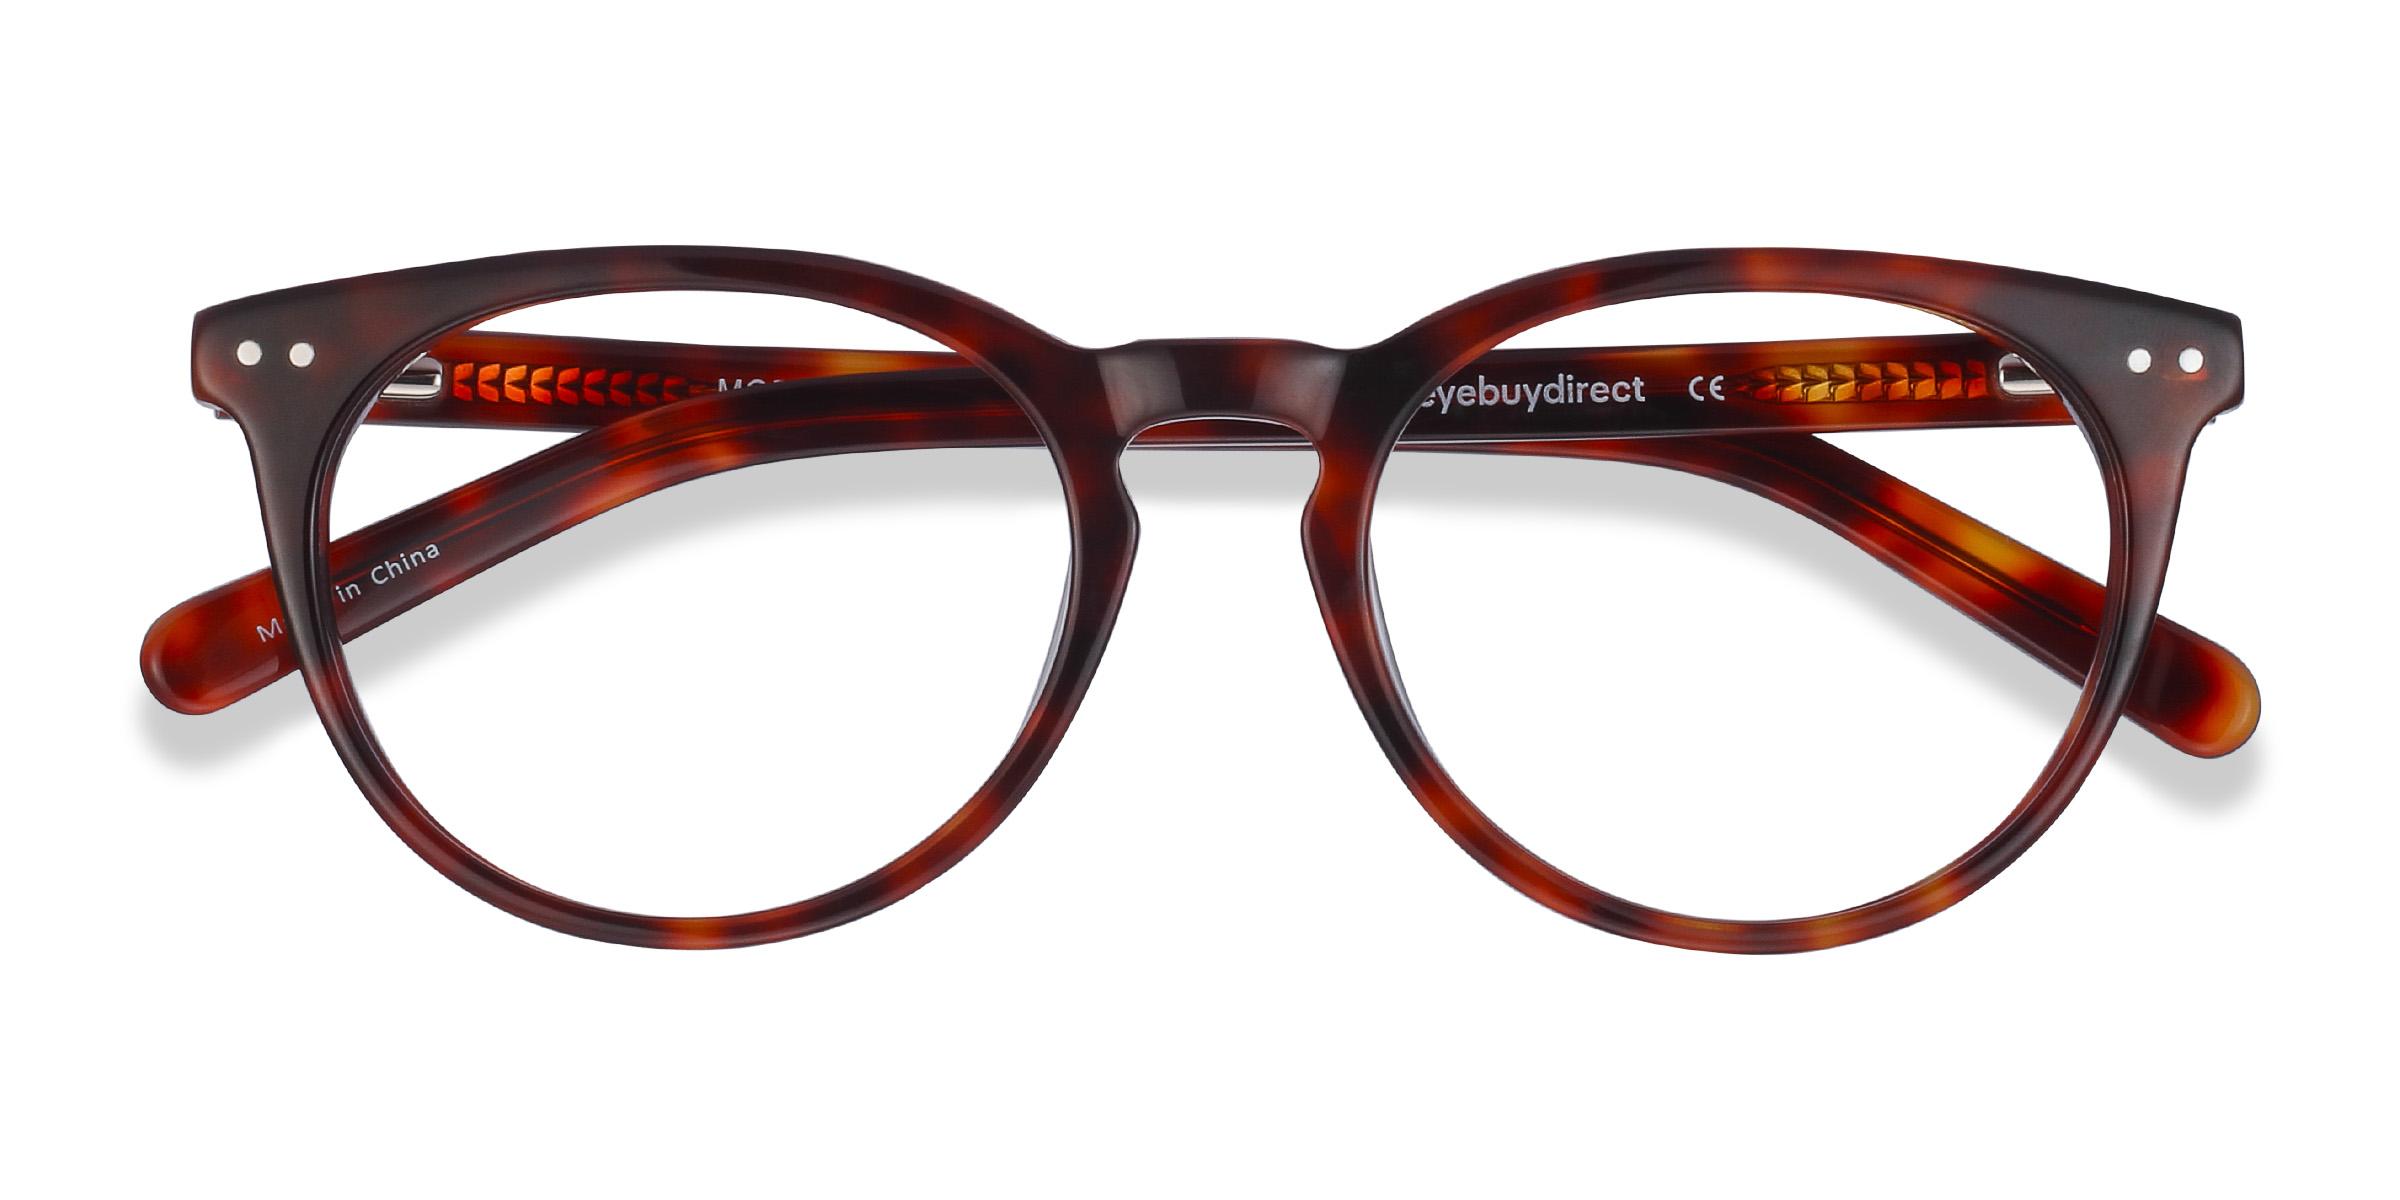 e4005bcfb Glasses & Sunglasses – Prescription Eyewear | EyeBuyDirect